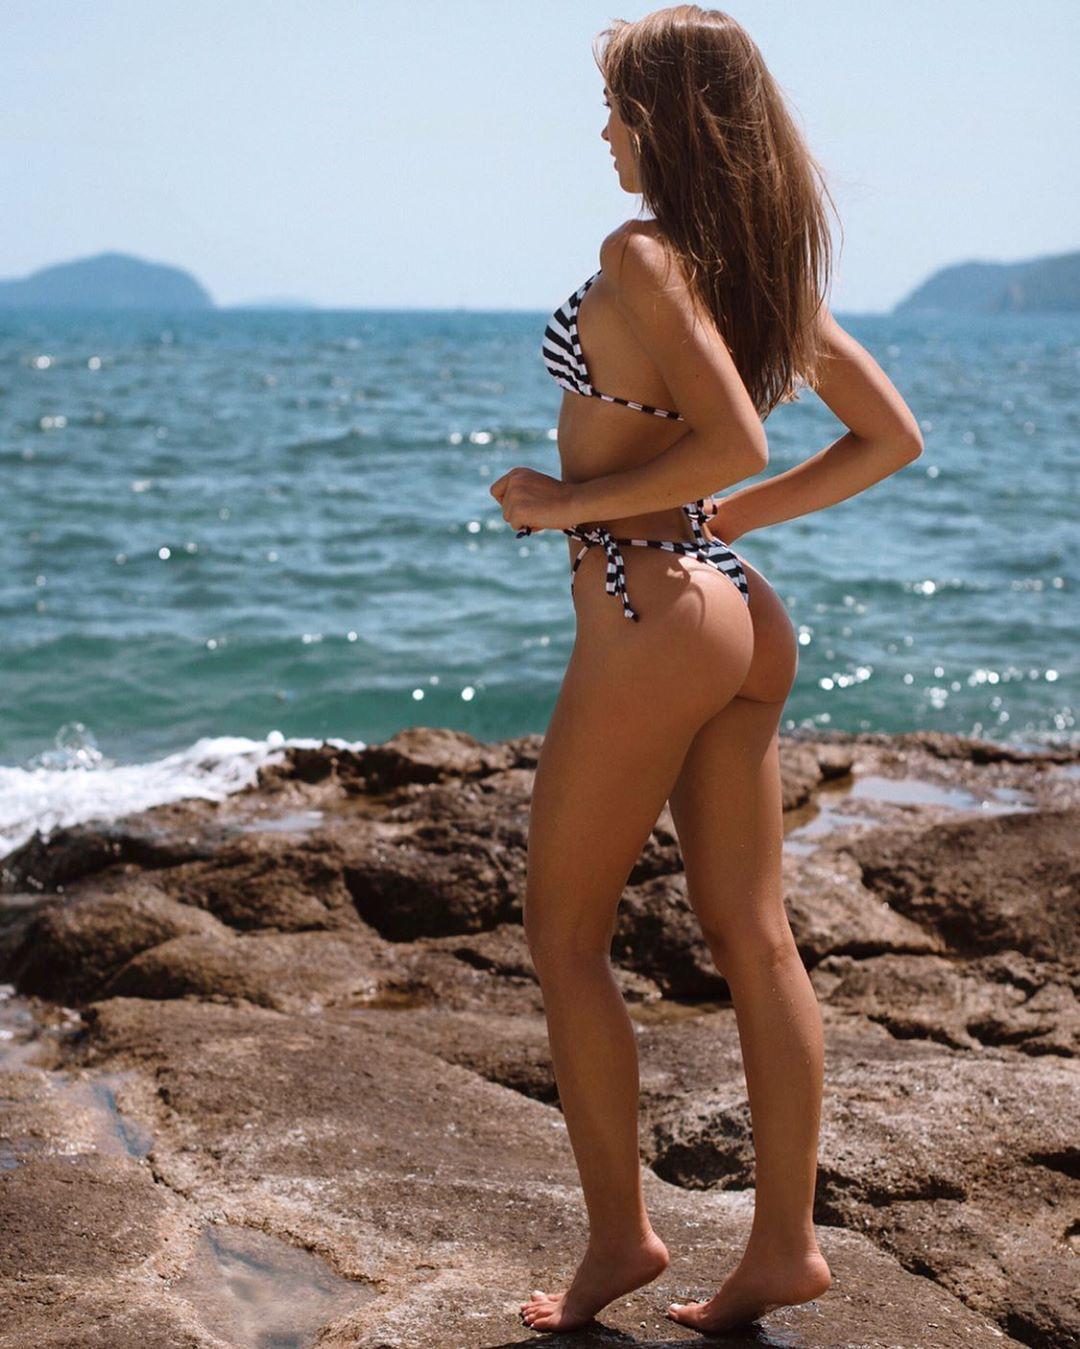 Galina Dub bikini swimwear matching ideas for girls, girls photography